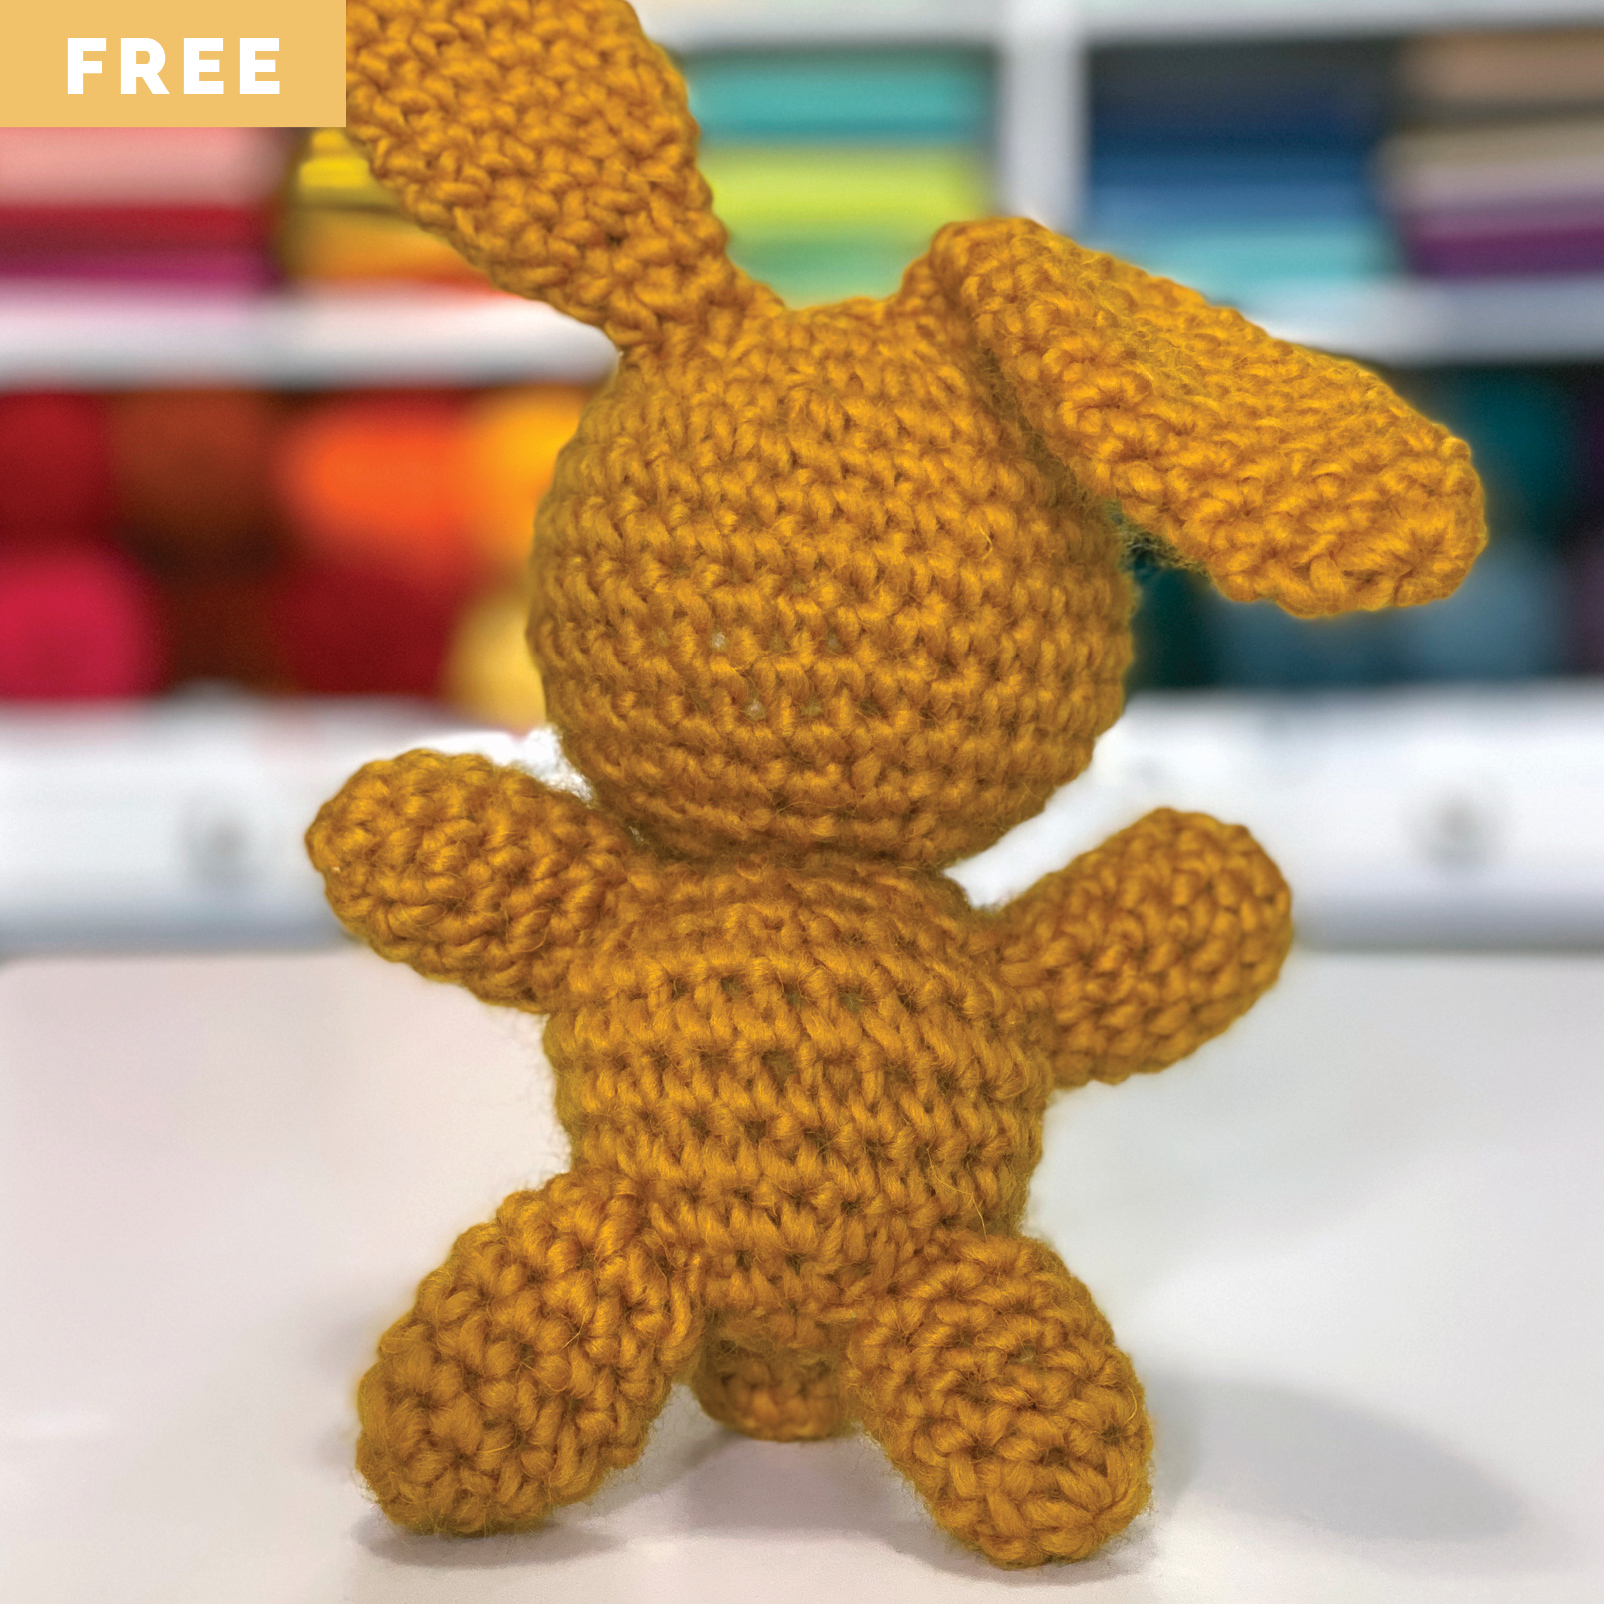 Free Crochet Pattern - Toy Bunny